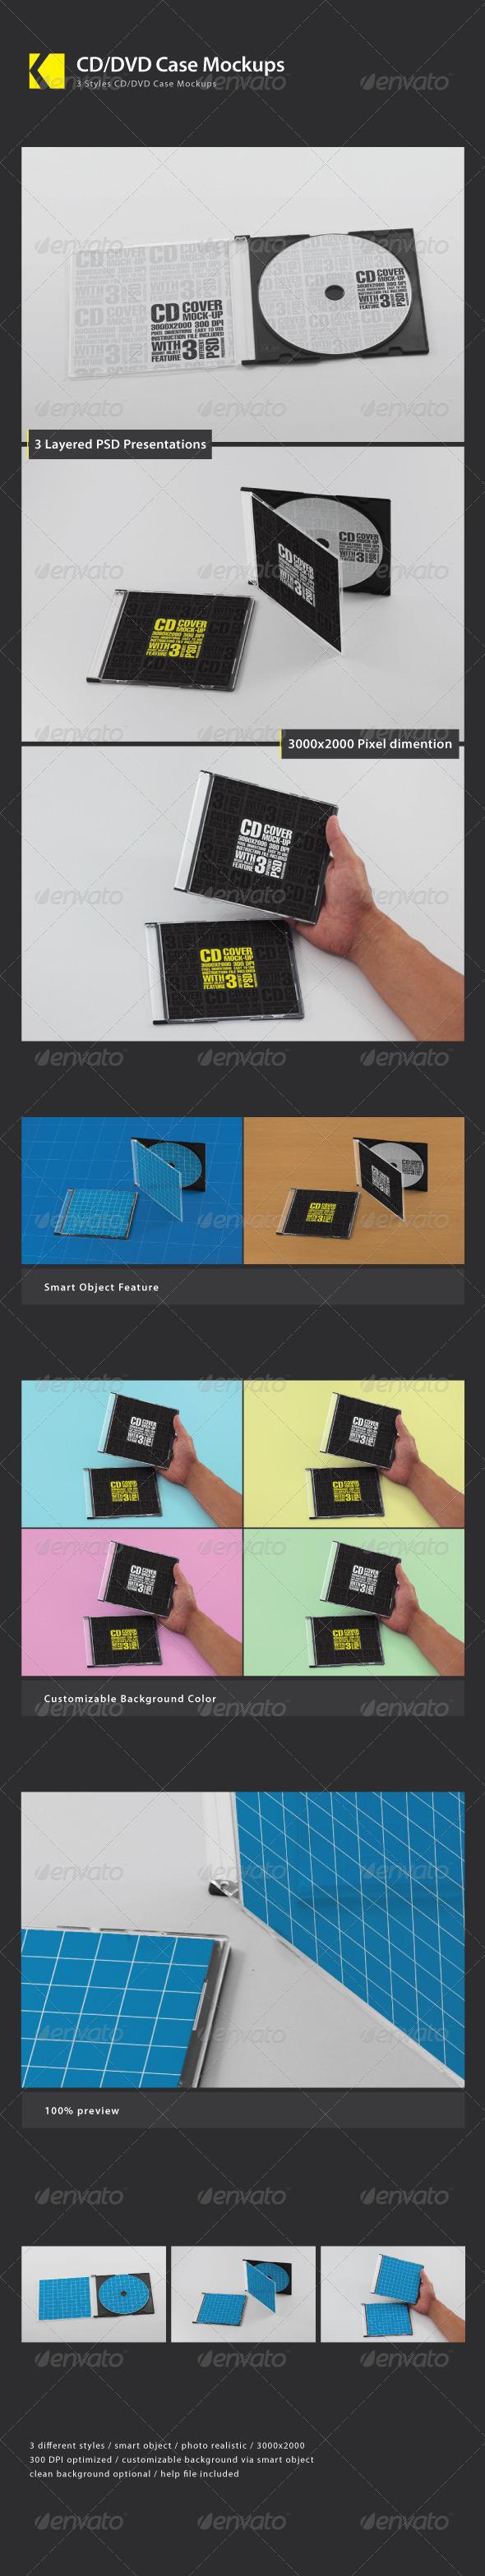 GraphicRiver CD DVD Case Mockup 6116320